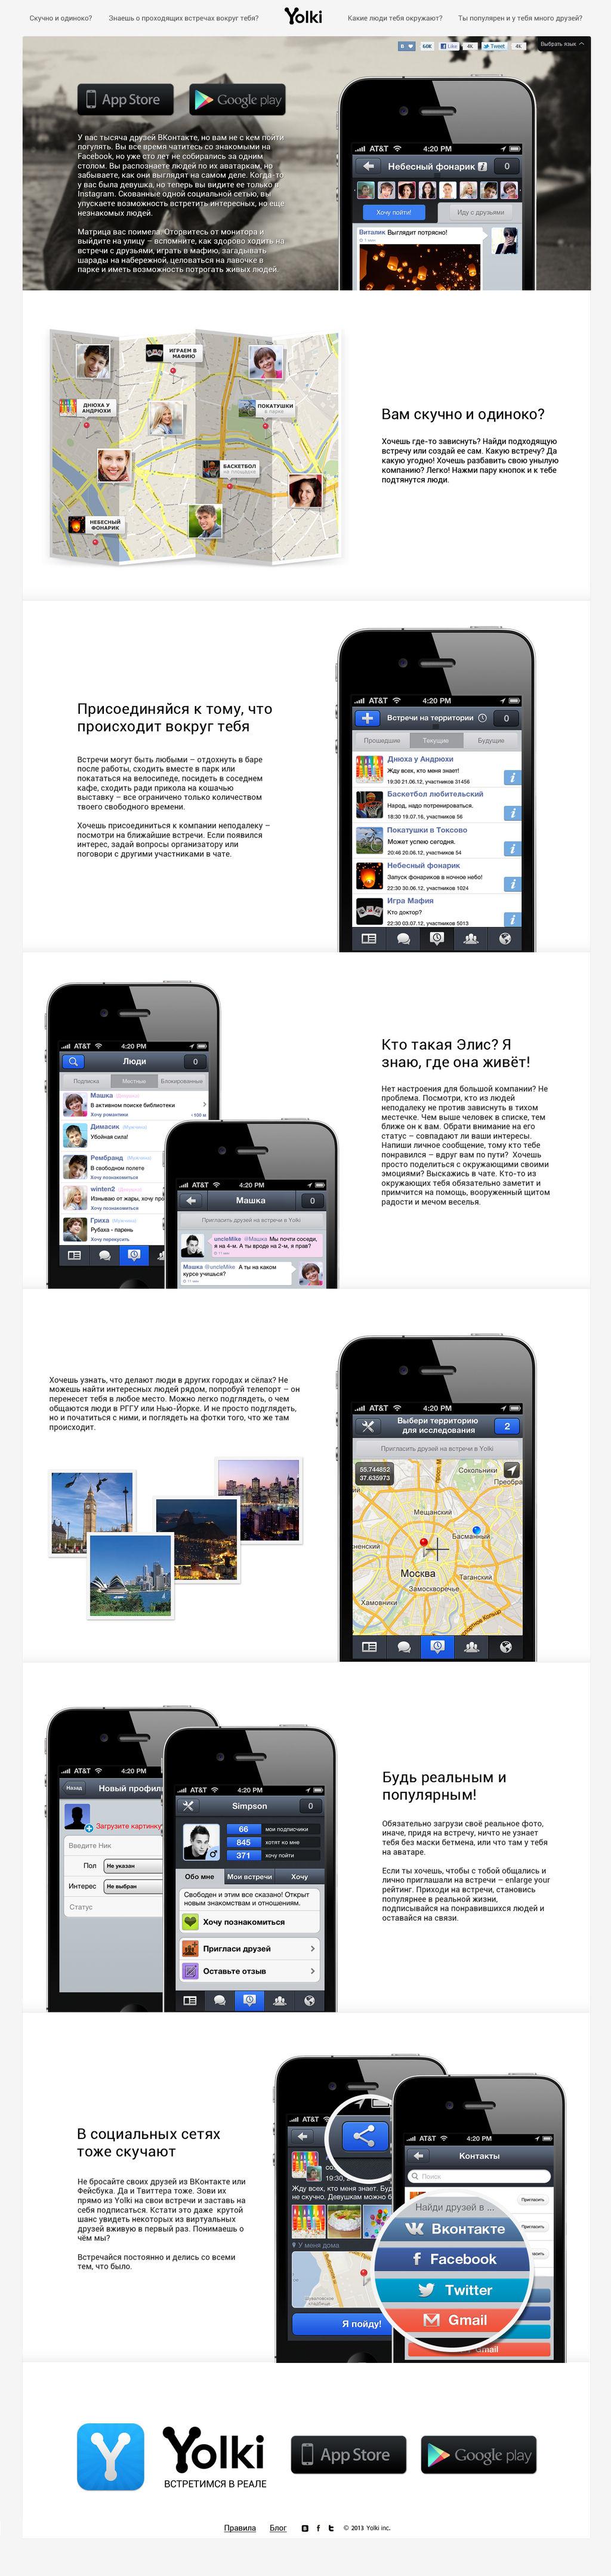 Yolki Web Design